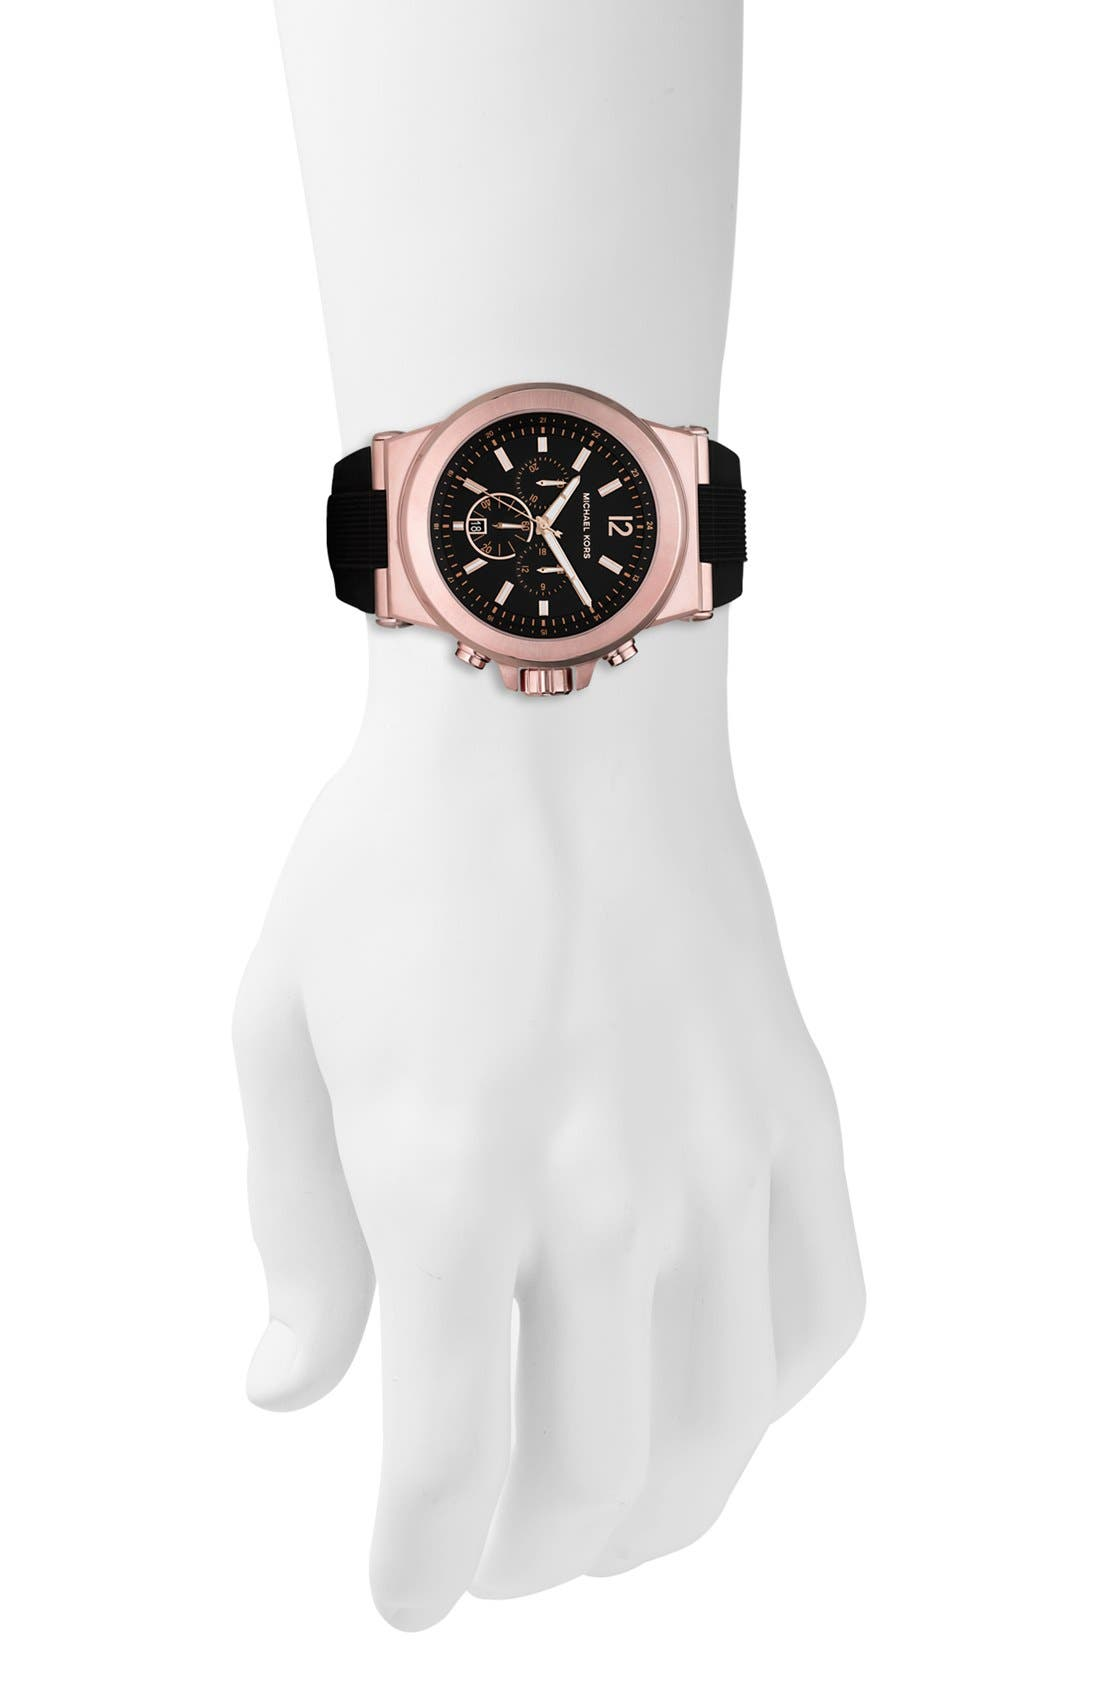 MICHAEL KORS, Chronograph Watch, 45mm, Alternate thumbnail 4, color, ROSE GOLD/ BLACK